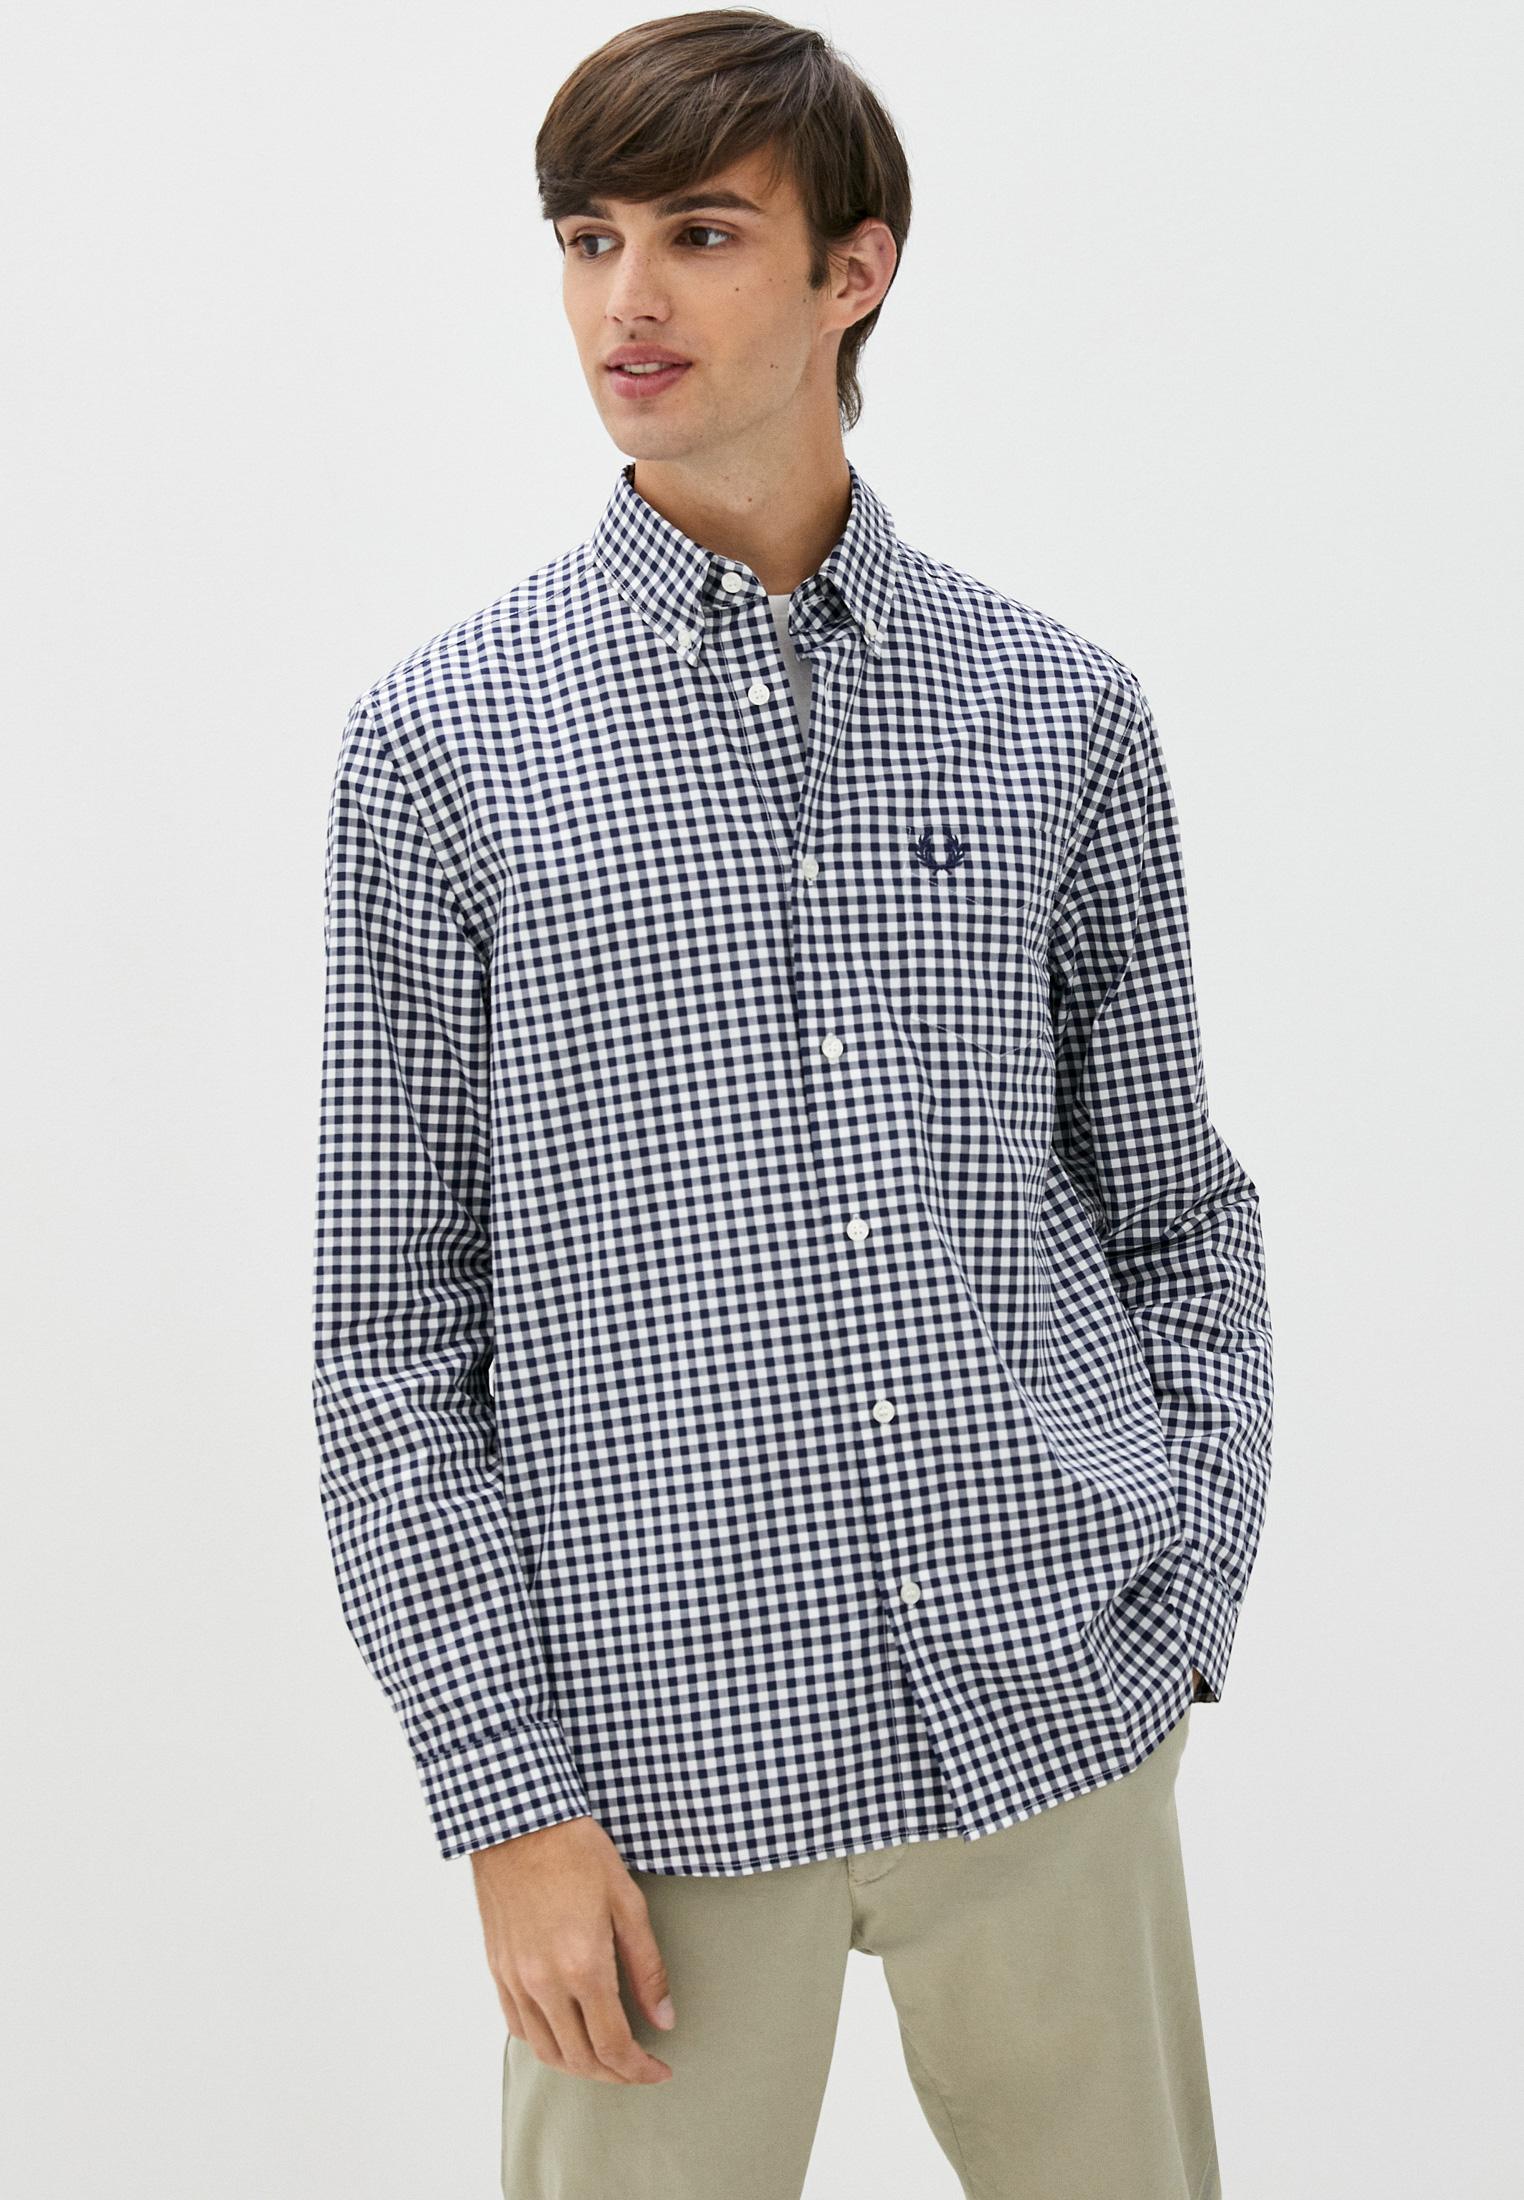 Рубашка с длинным рукавом Fred Perry (Фред Перри) M9500